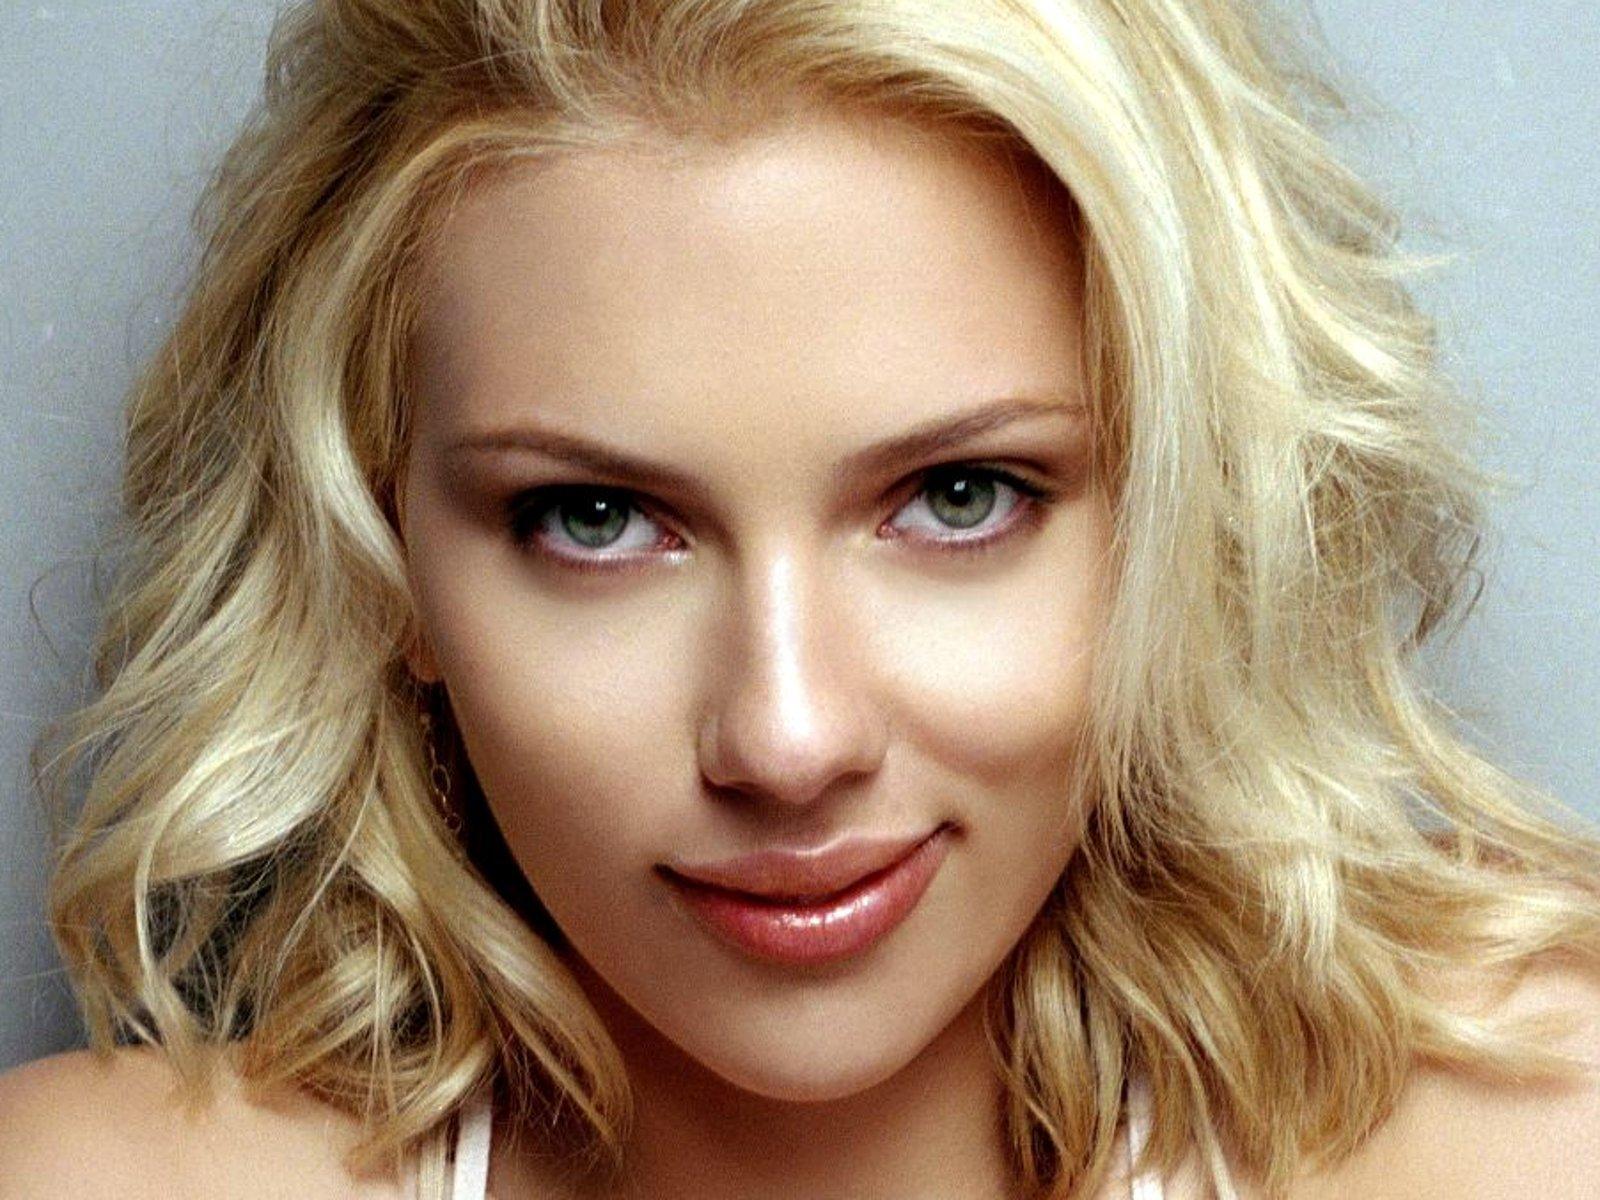 http://1.bp.blogspot.com/-EwH5eOtwEXM/TqMP1B8OSNI/AAAAAAAAD0M/L-ySskn2cog/s1600/Scarlett+Johansson+face.jpg